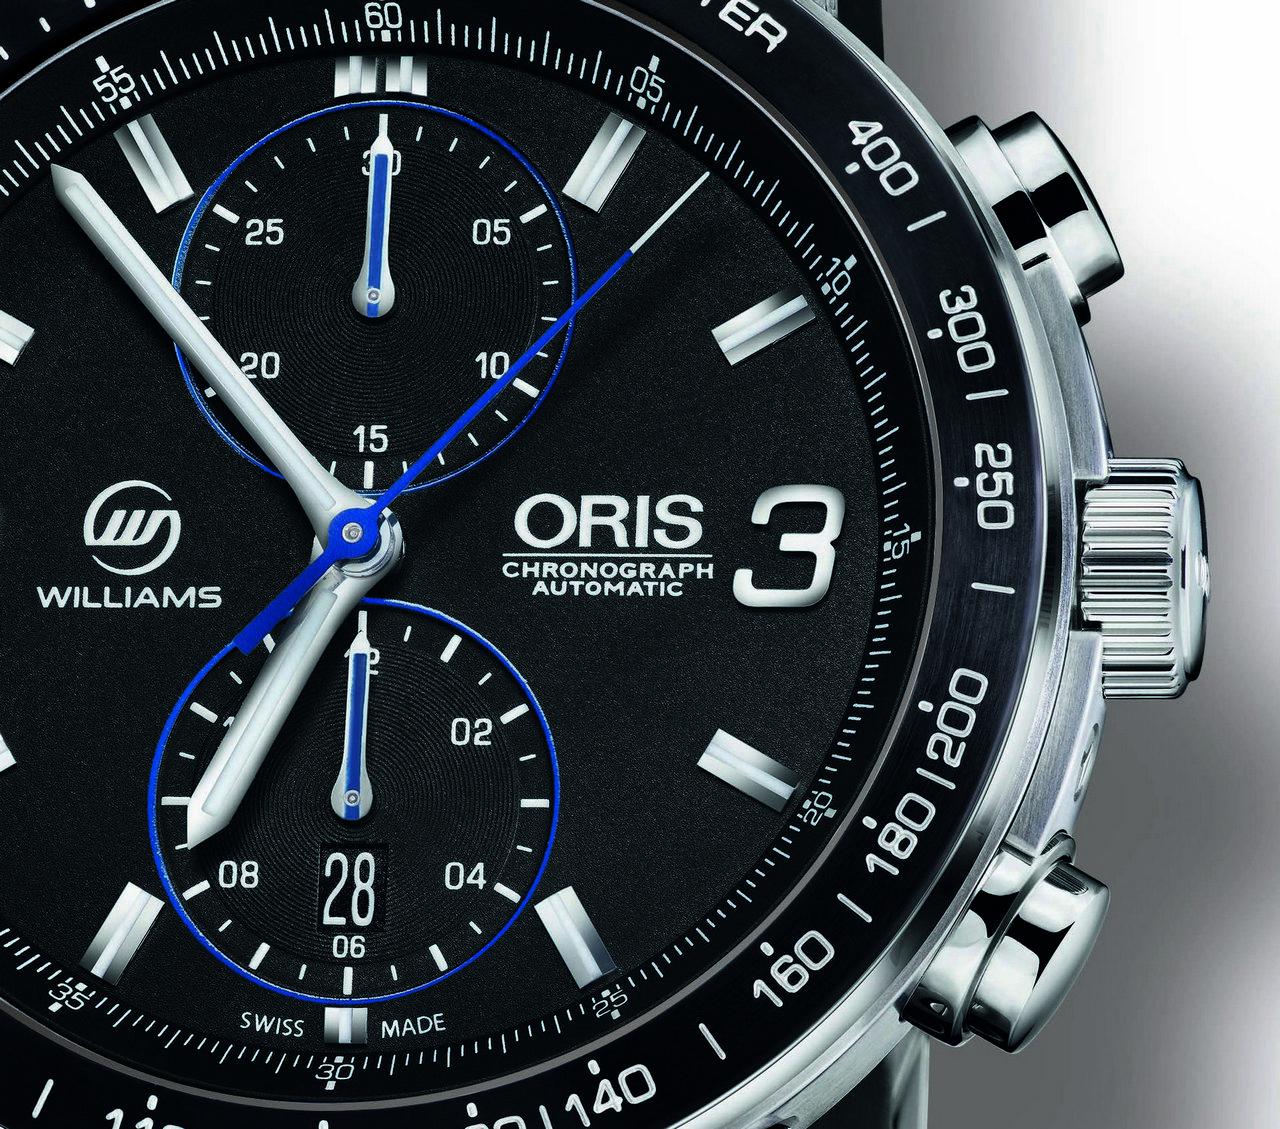 oris-williams-f1-team-600th-race-limited-edition_0-100_3